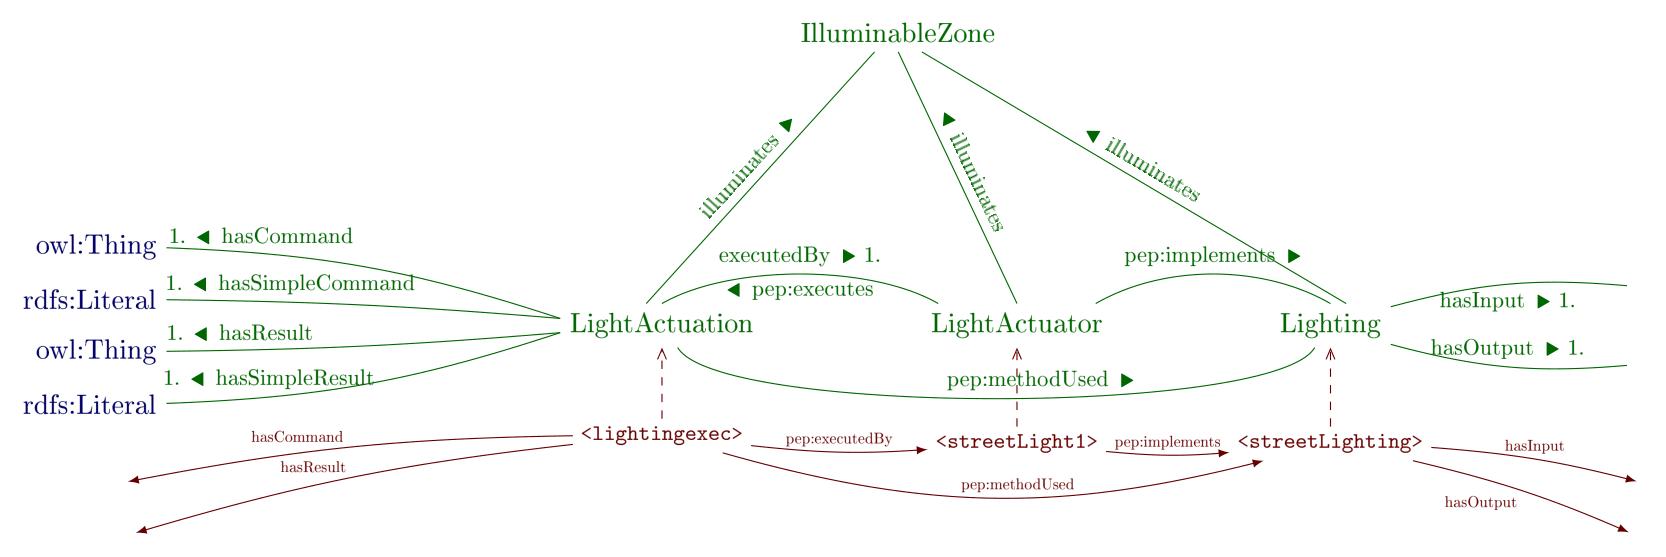 lightgActuator